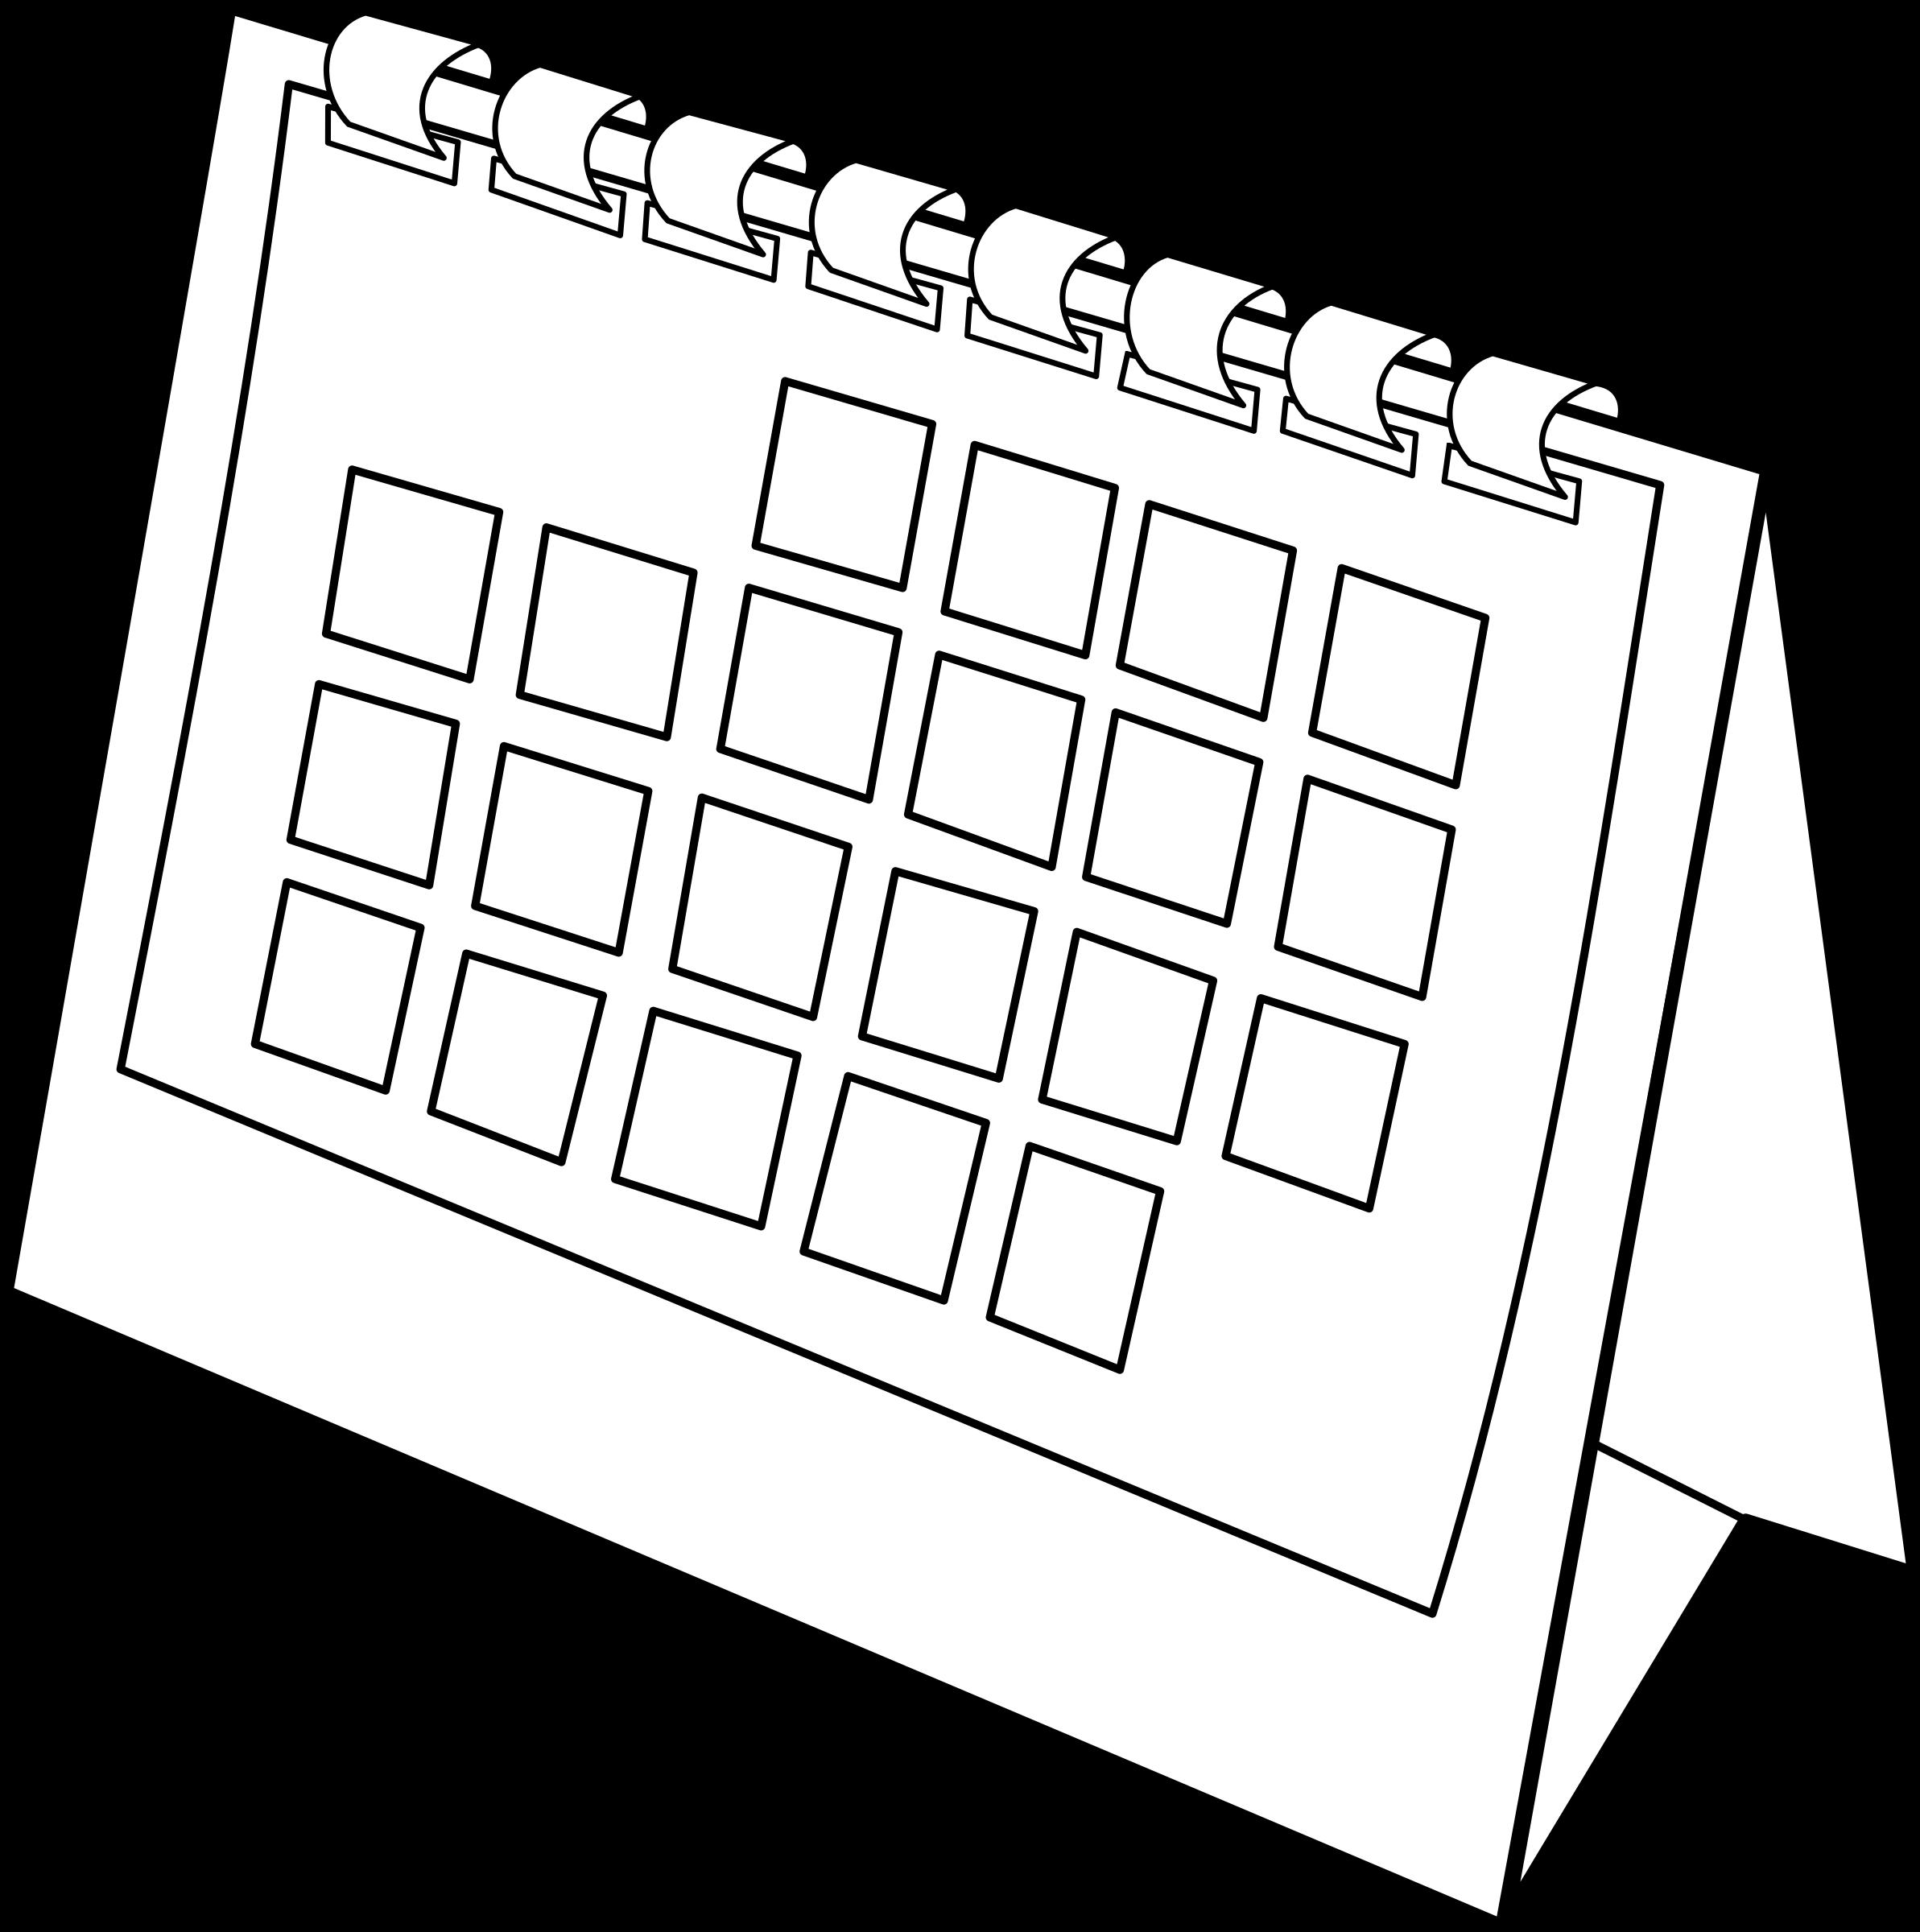 calendrier / calendar by lmproulx